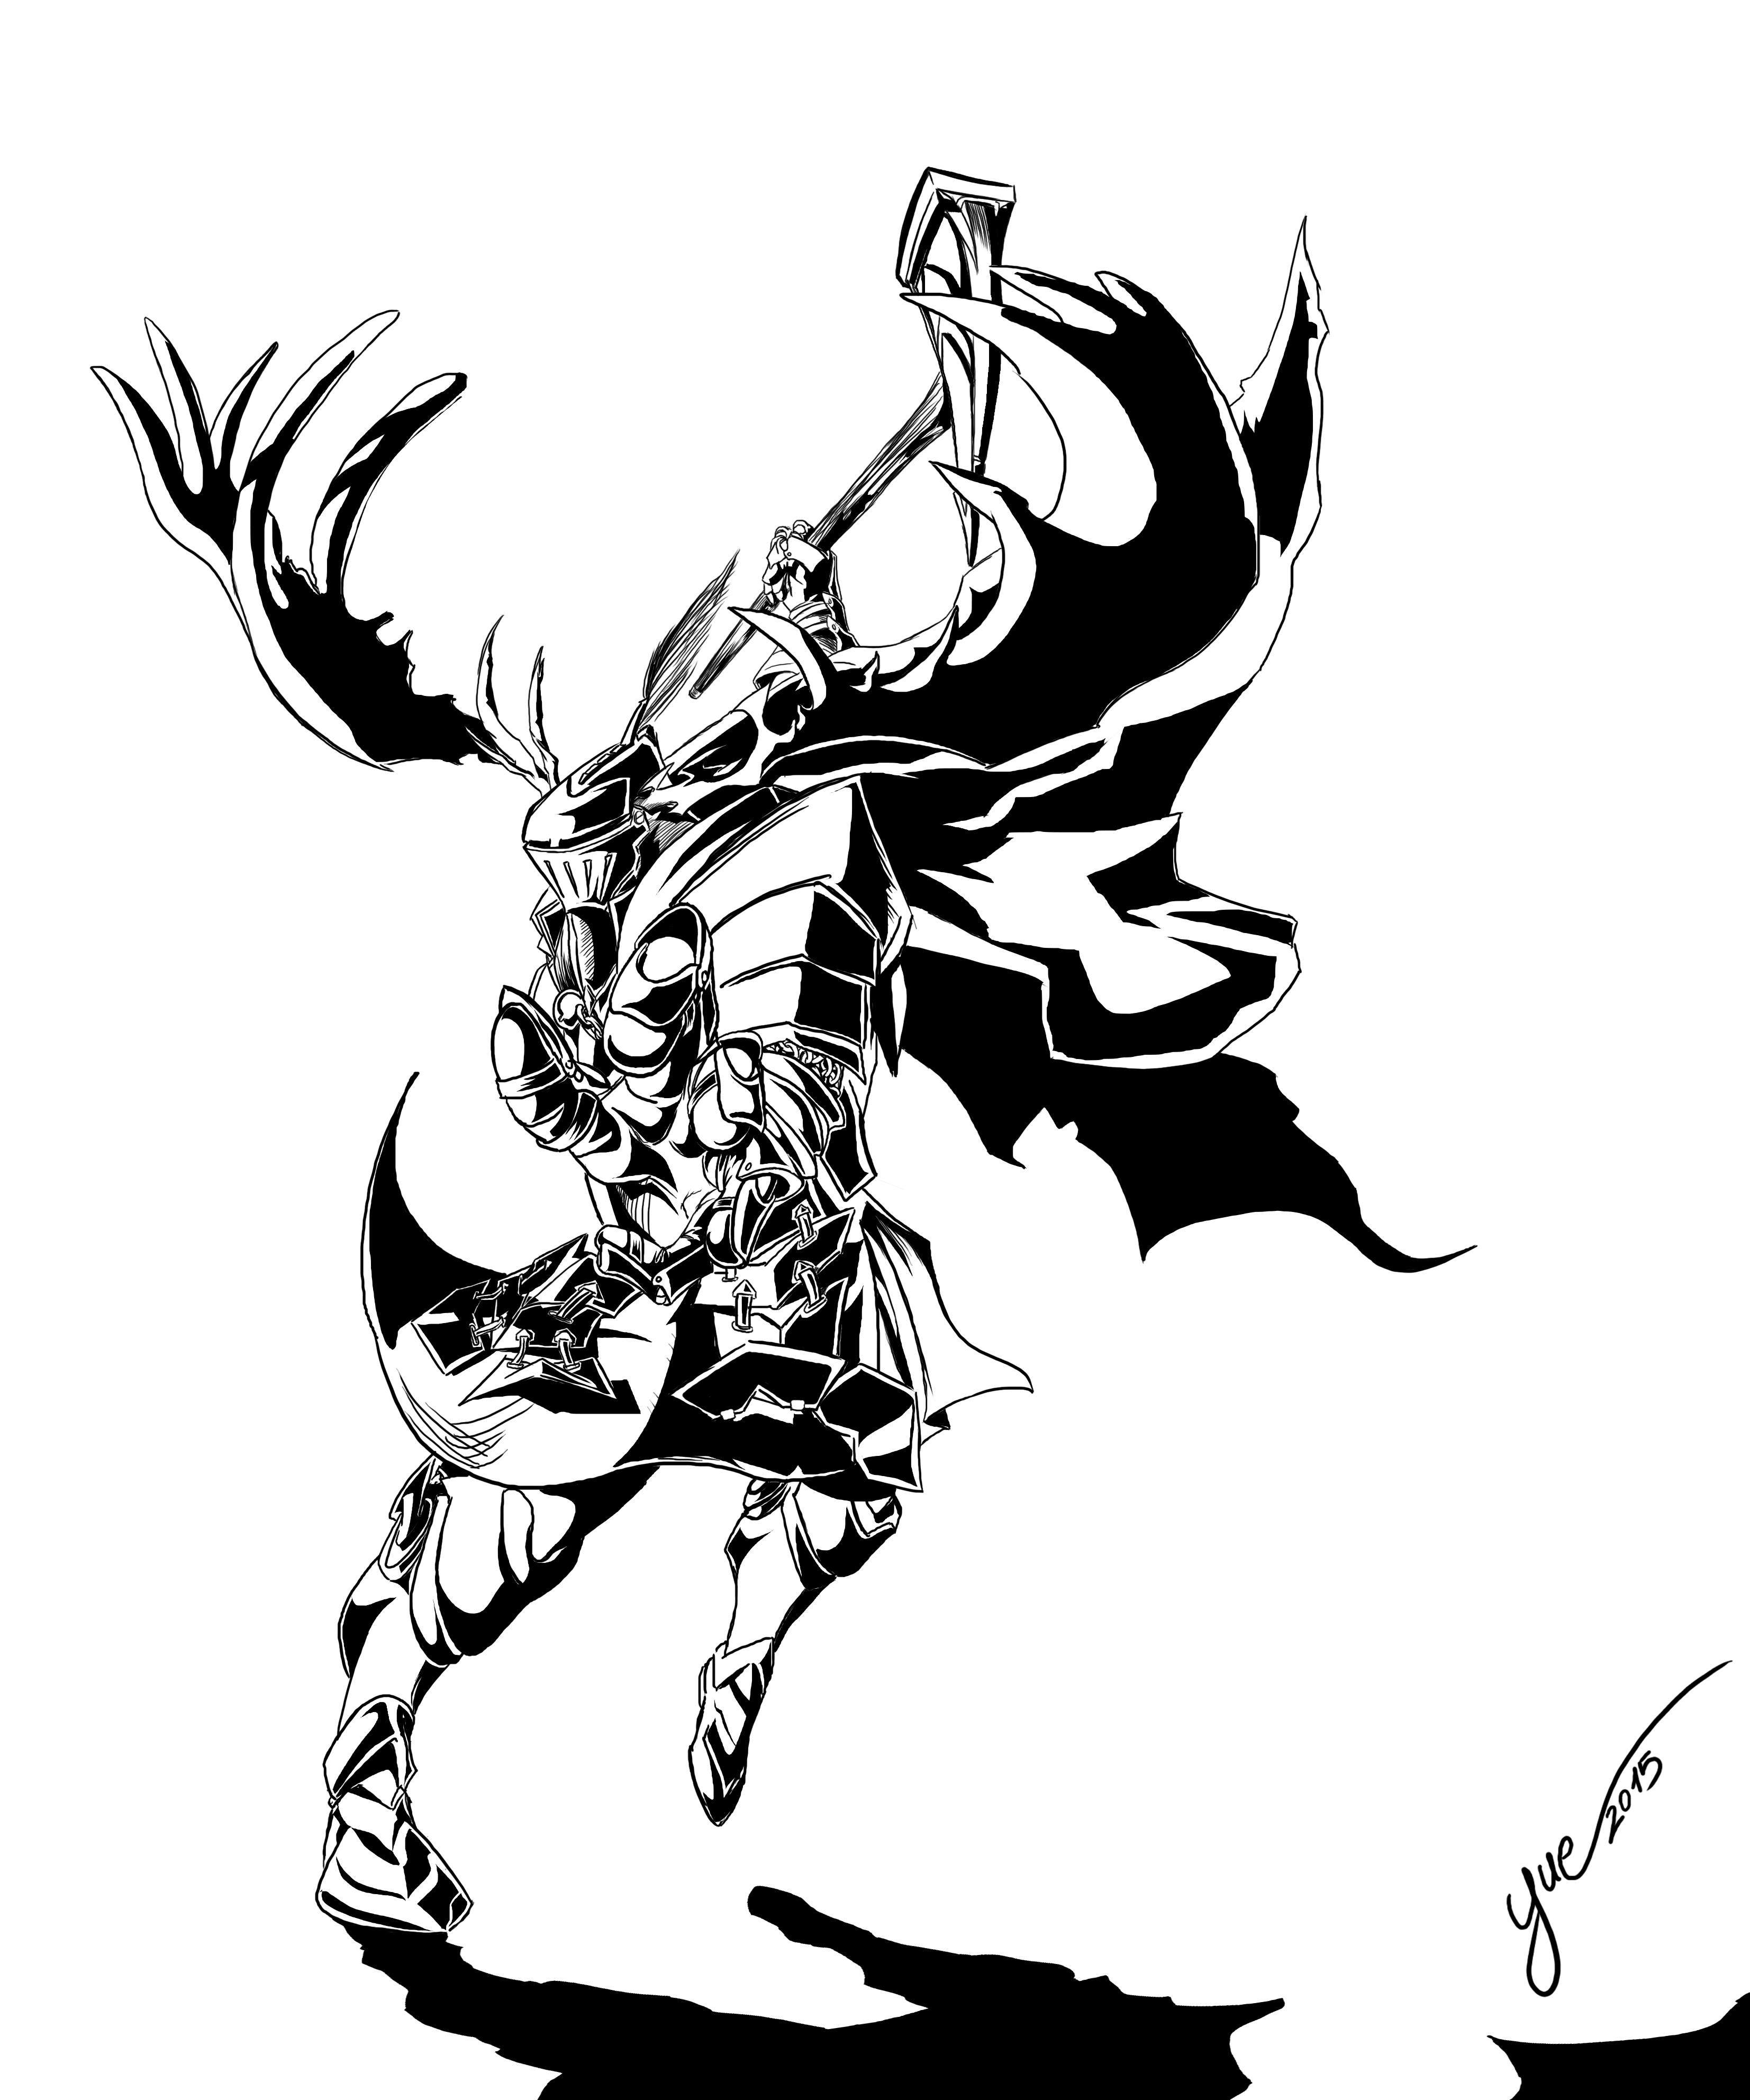 Robert Baratheon clipart #1, Download drawings